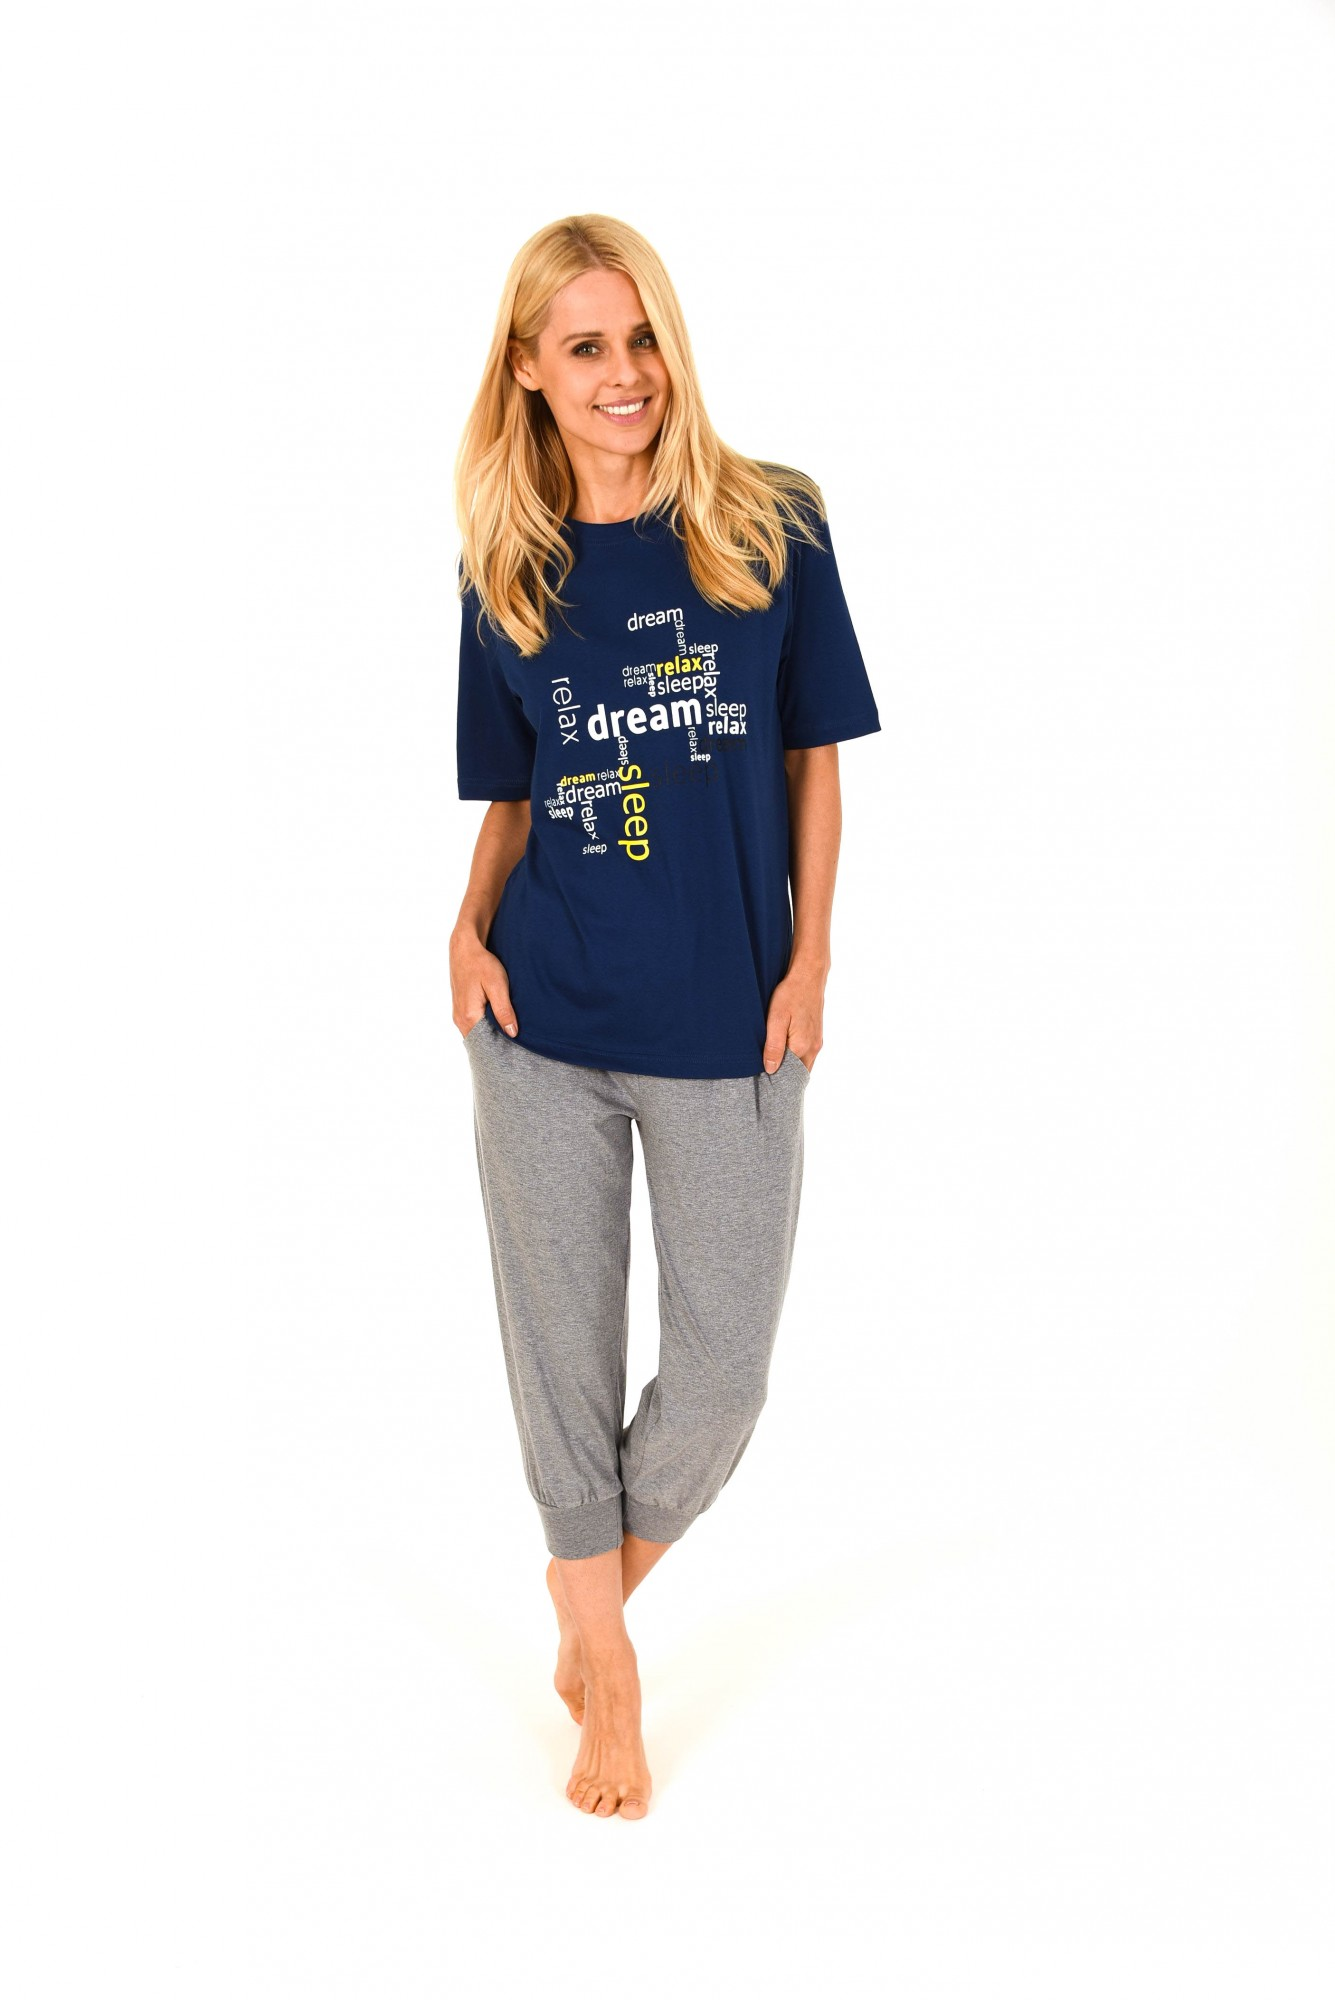 Damen Capri Pyjama 7/8-lange Hose und kurzarm Oberteil – 171 204 90 828 001